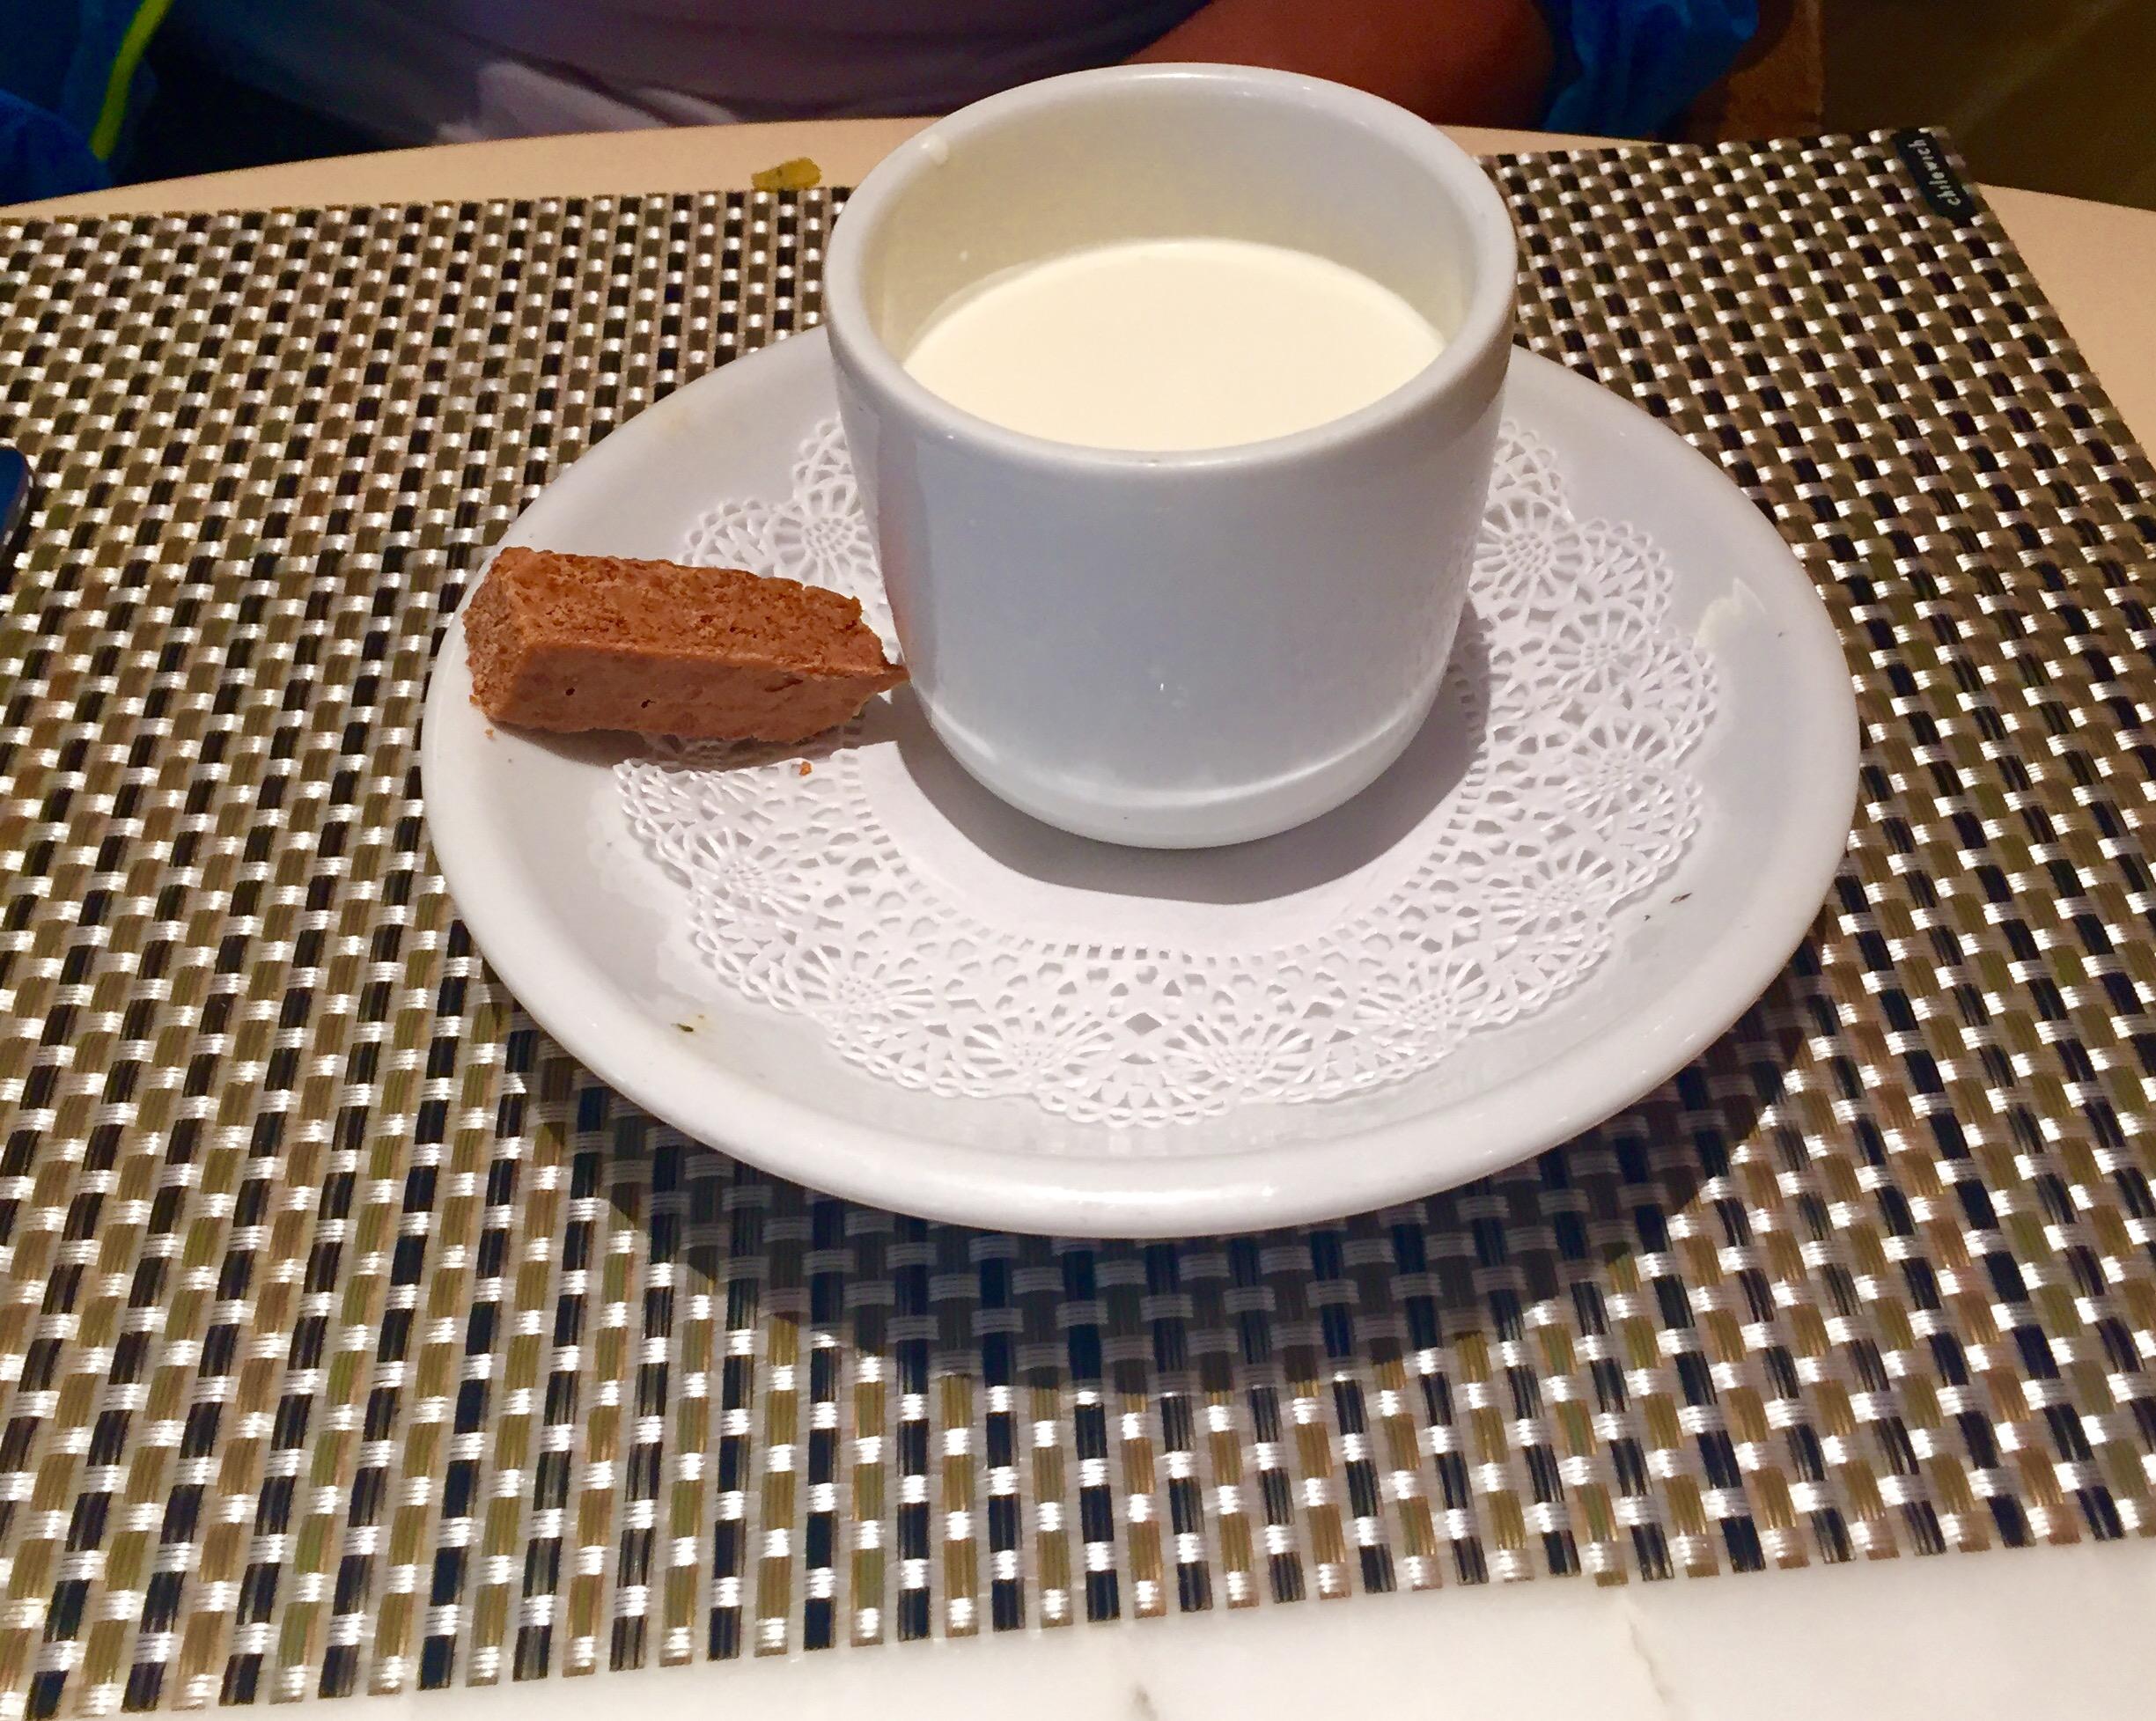 Chocolate Pot de Creme:   Crunchy praline financiers & vanilla cream